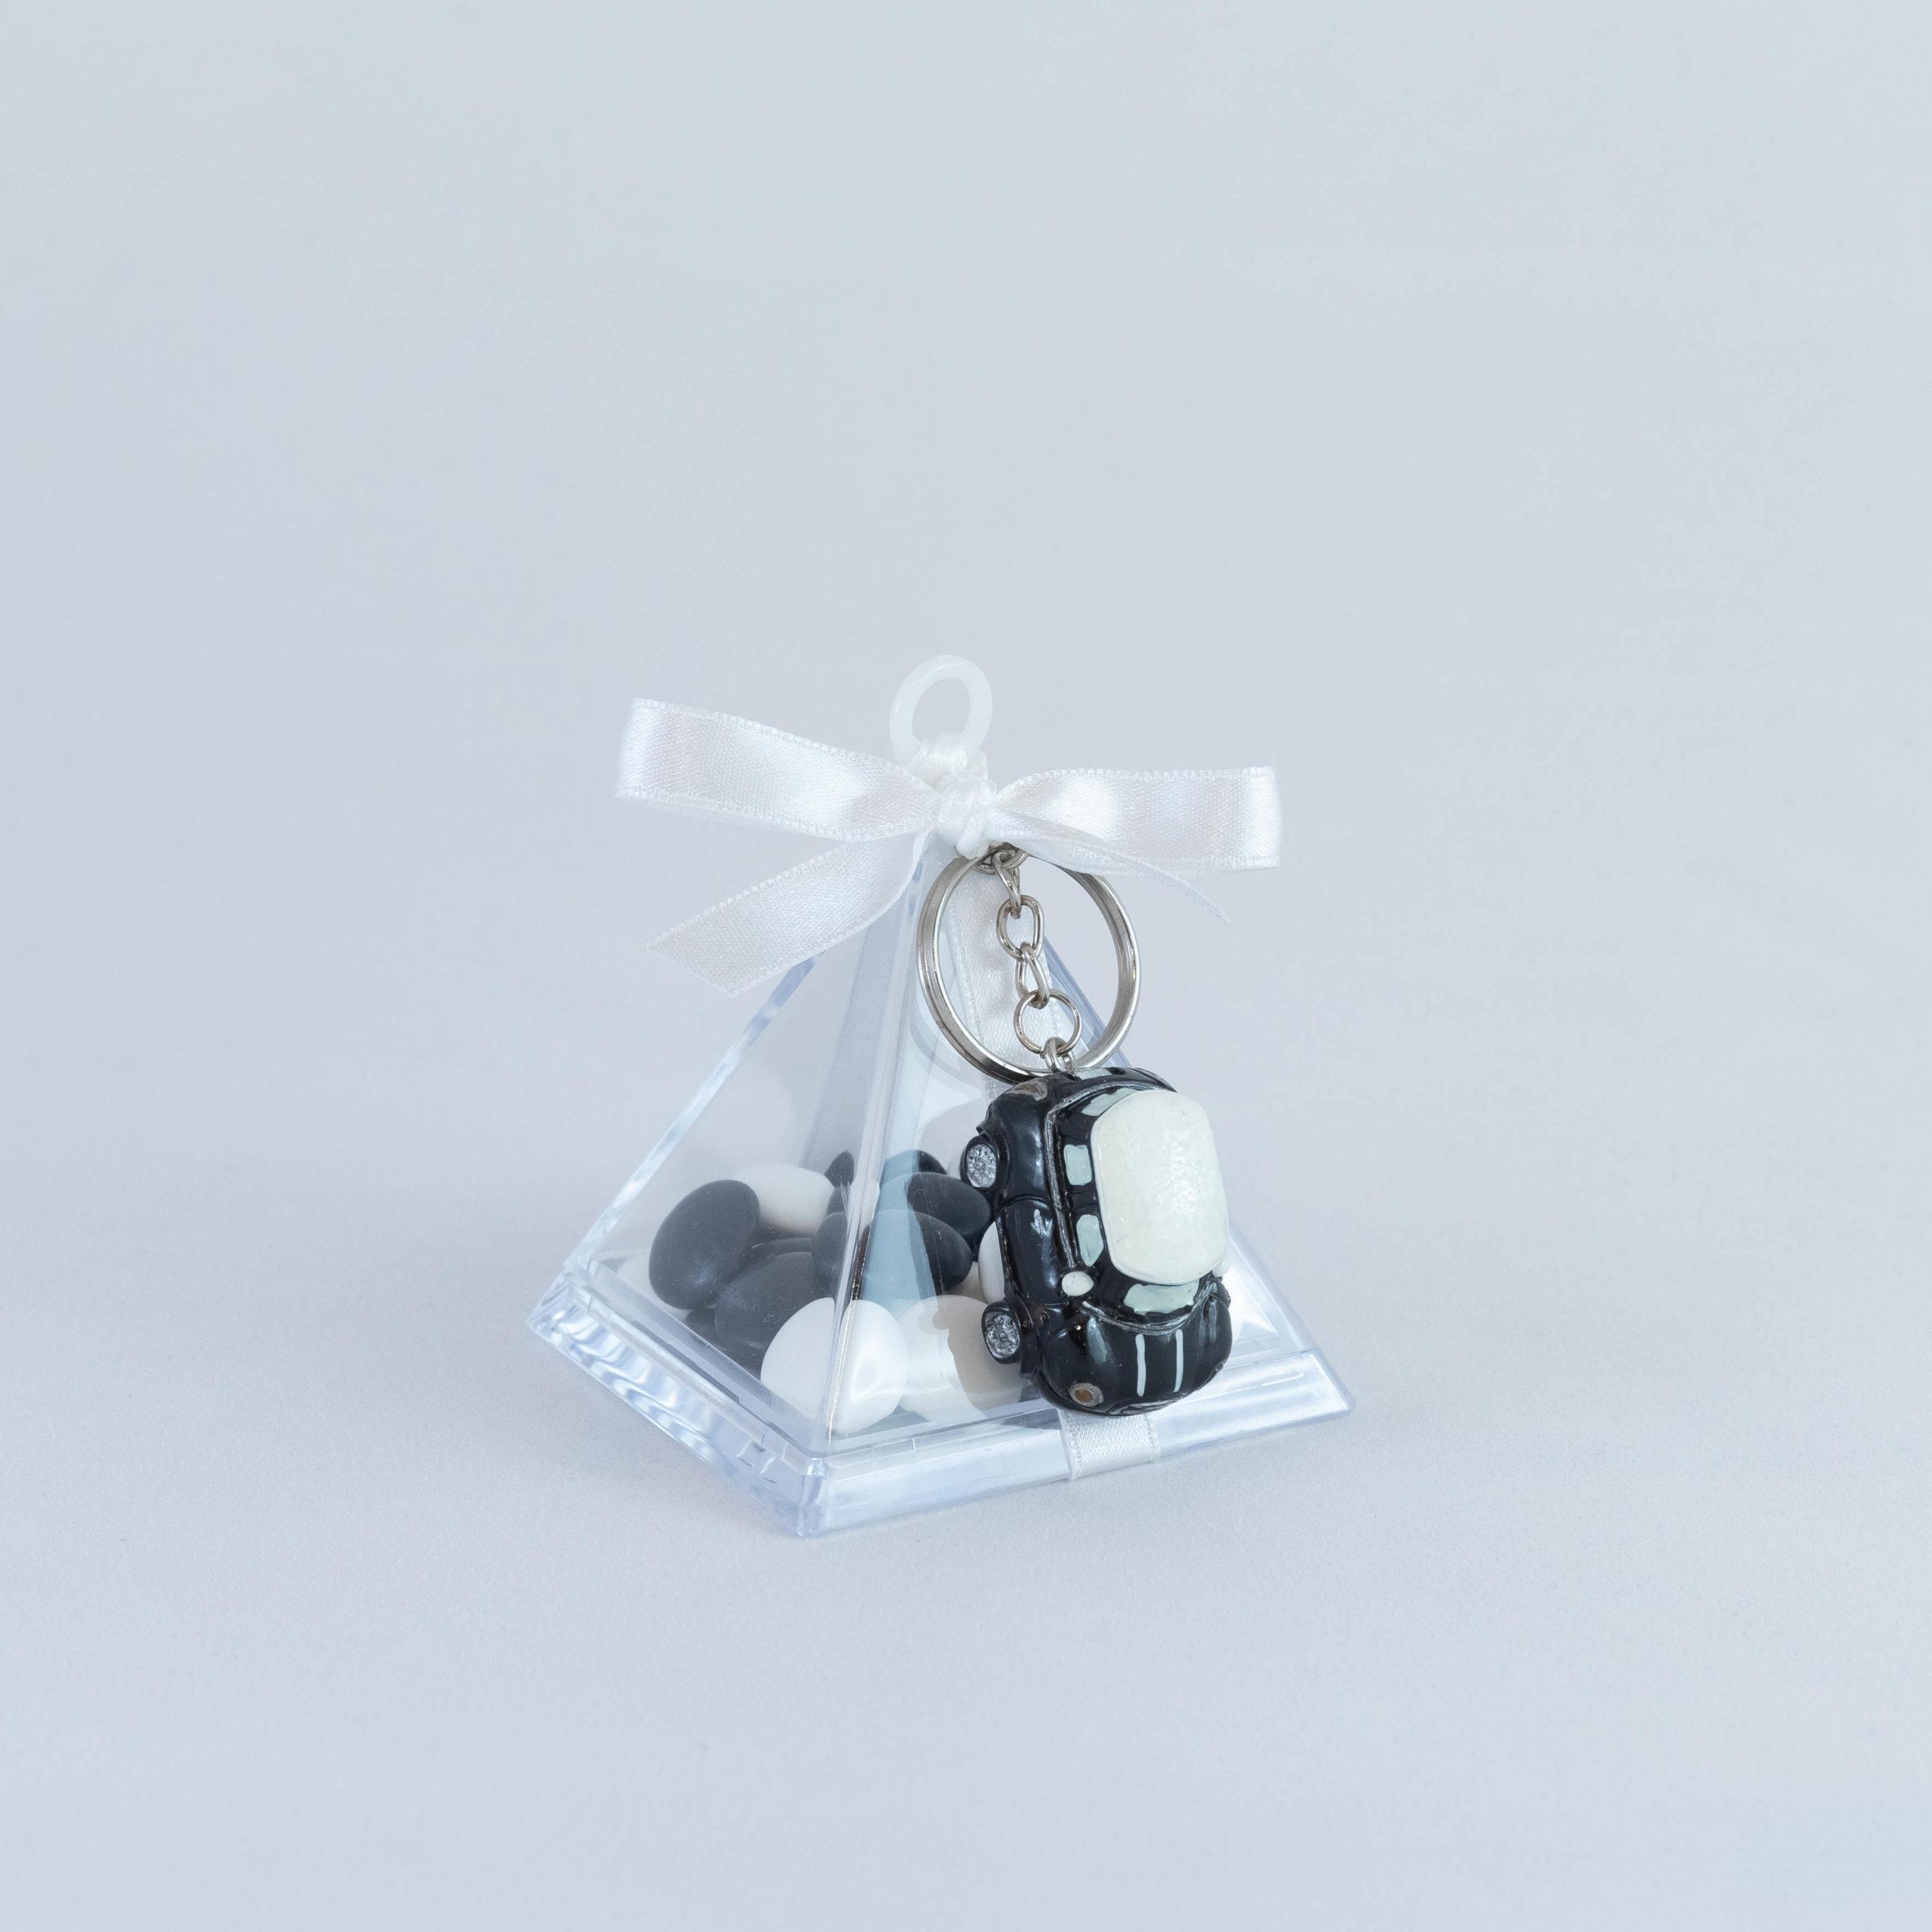 Mini Cooper noire Pyramide - Véhicule Image